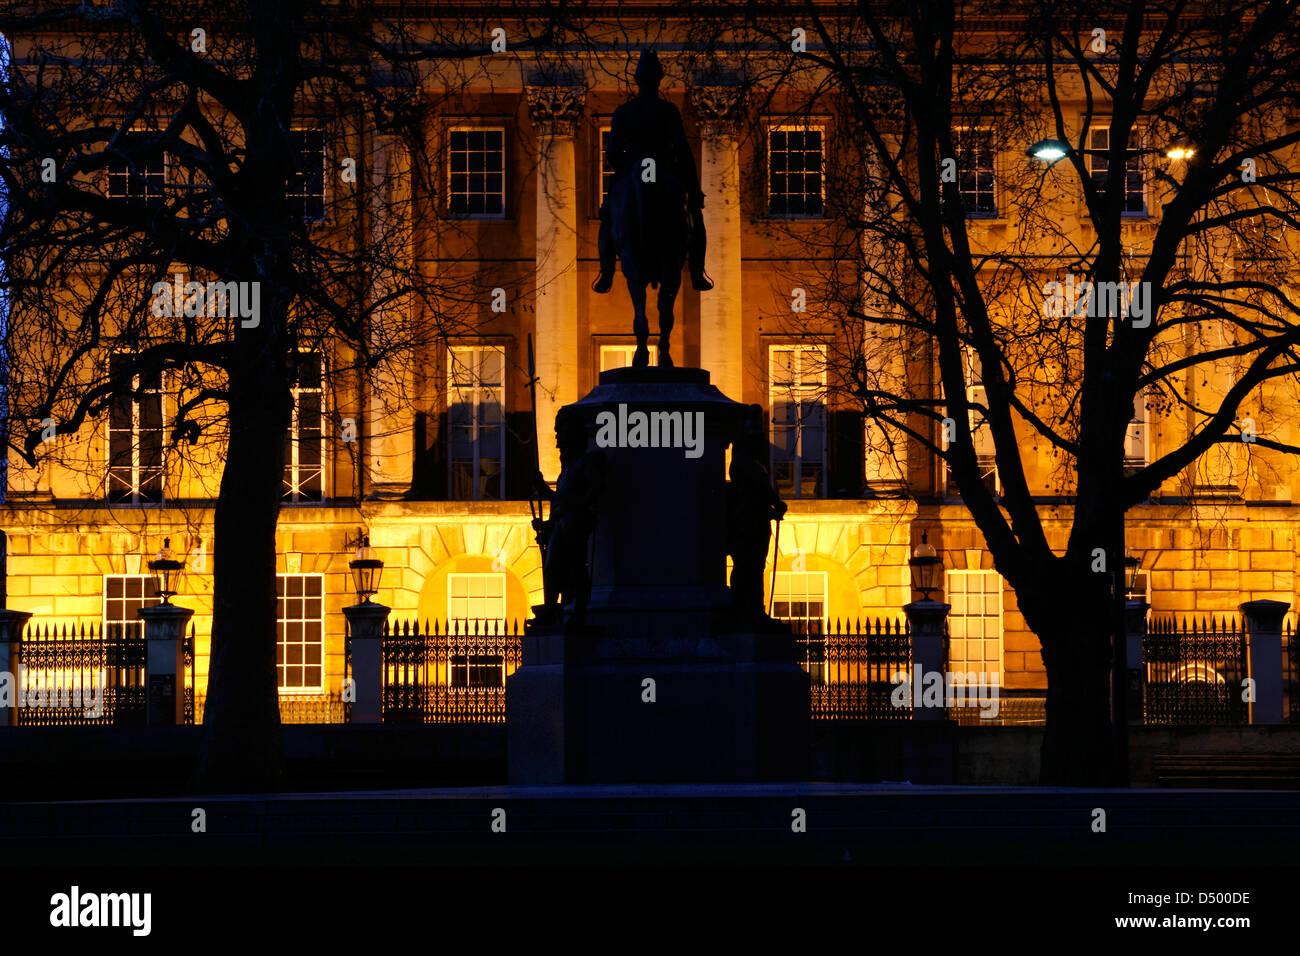 Statue of Duke of Wellington framed by a floodlit Apsley House, Hyde Park Corner, London, UK - Stock Image